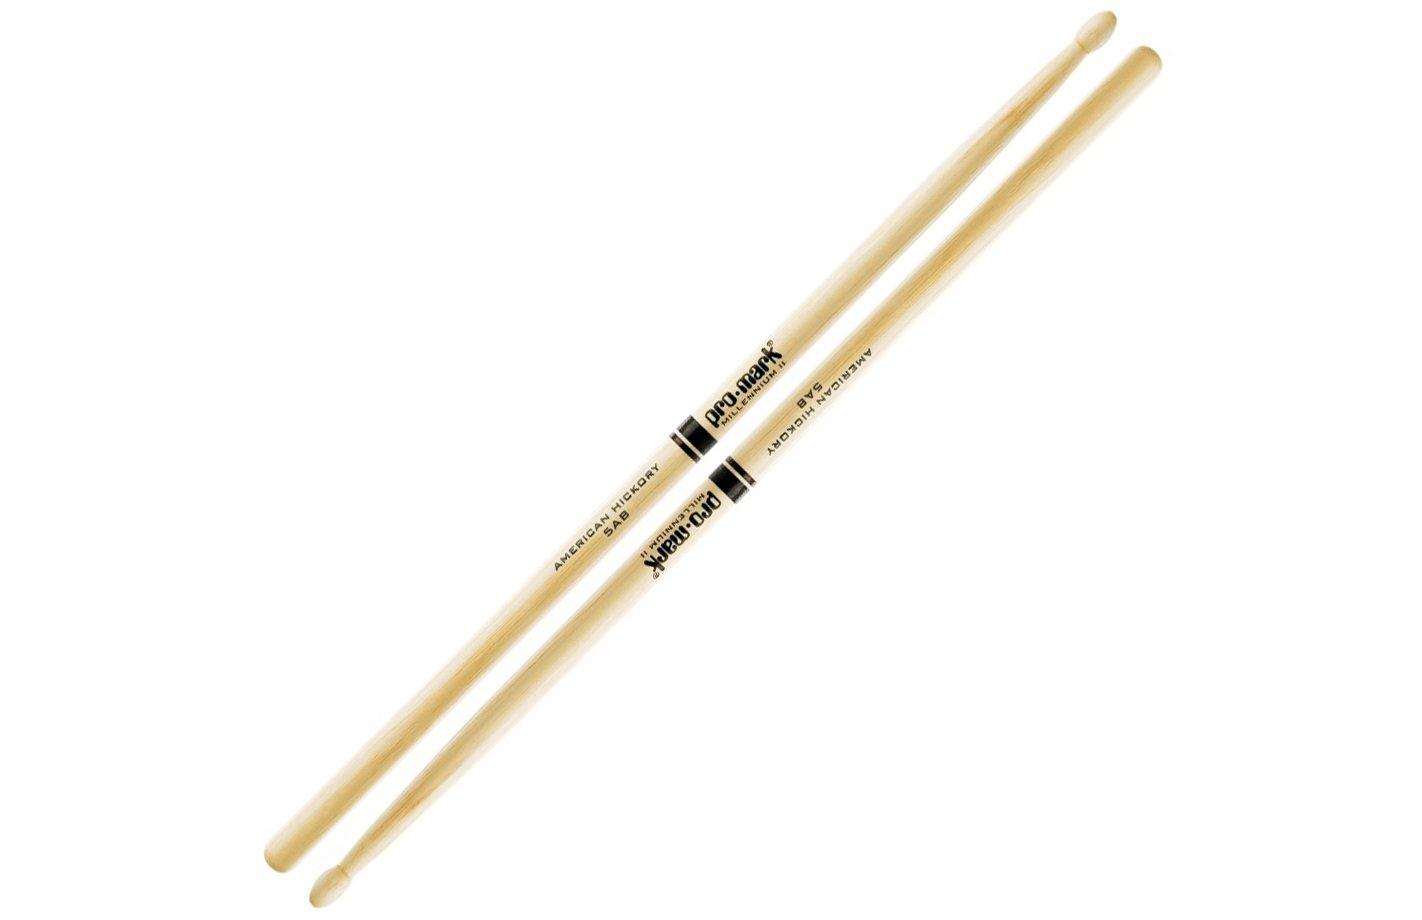 Promark TX5AB Hickory Drumsticks